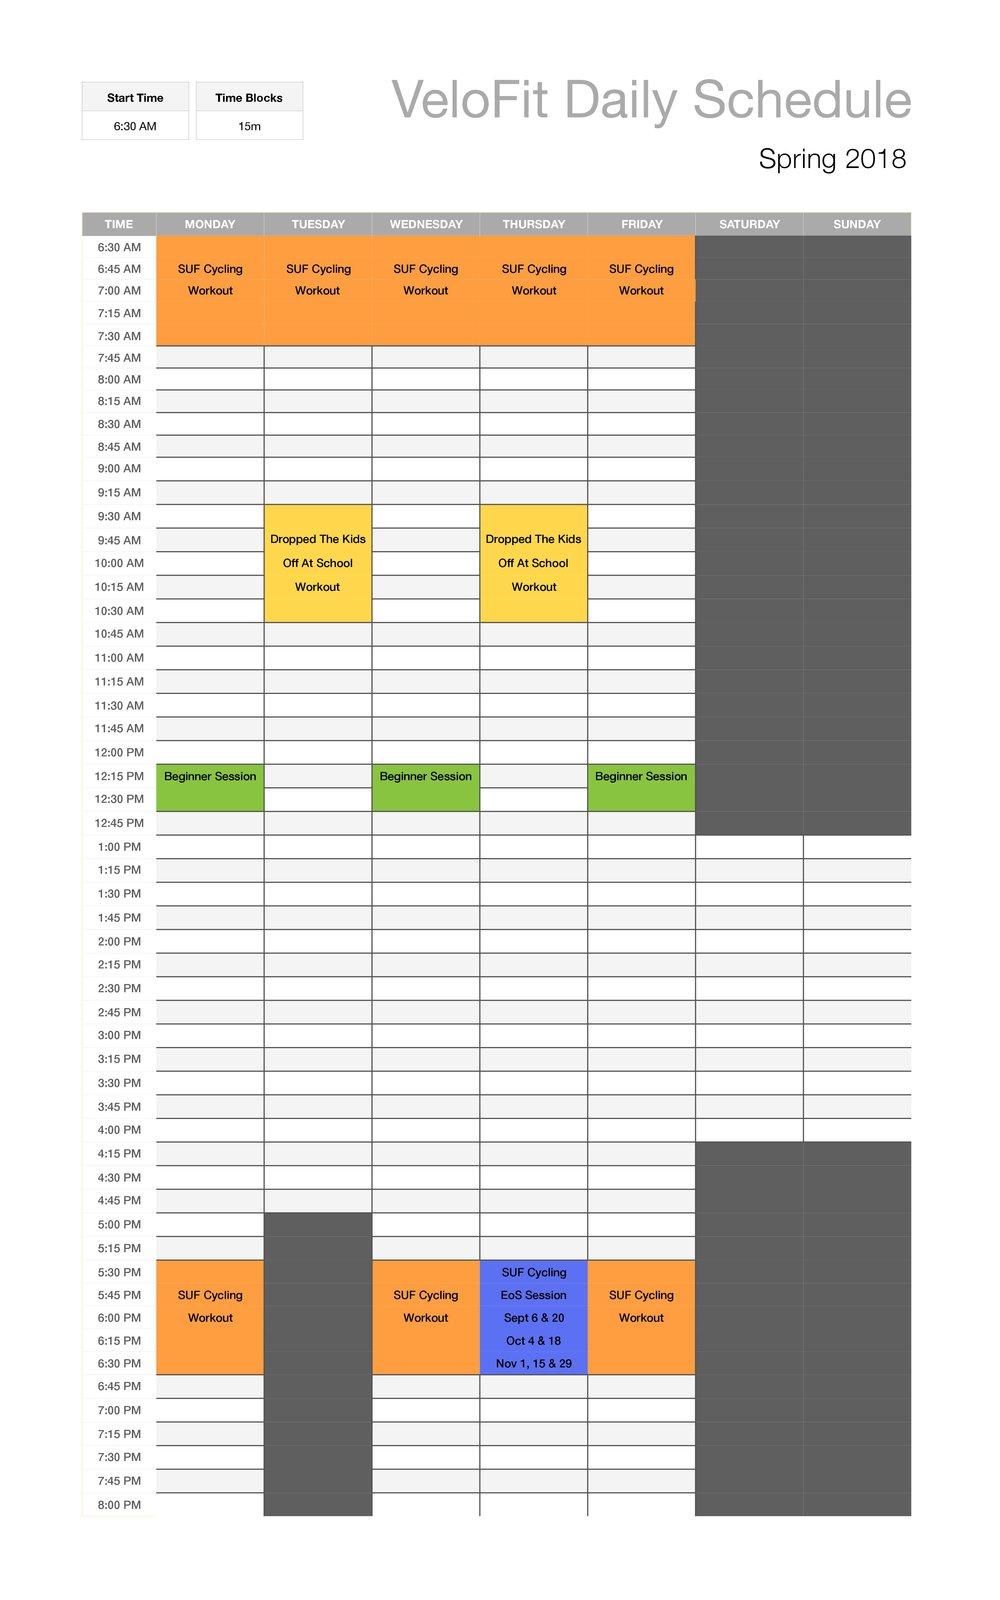 VeloFitSessionScheduleSpring2018.jpg